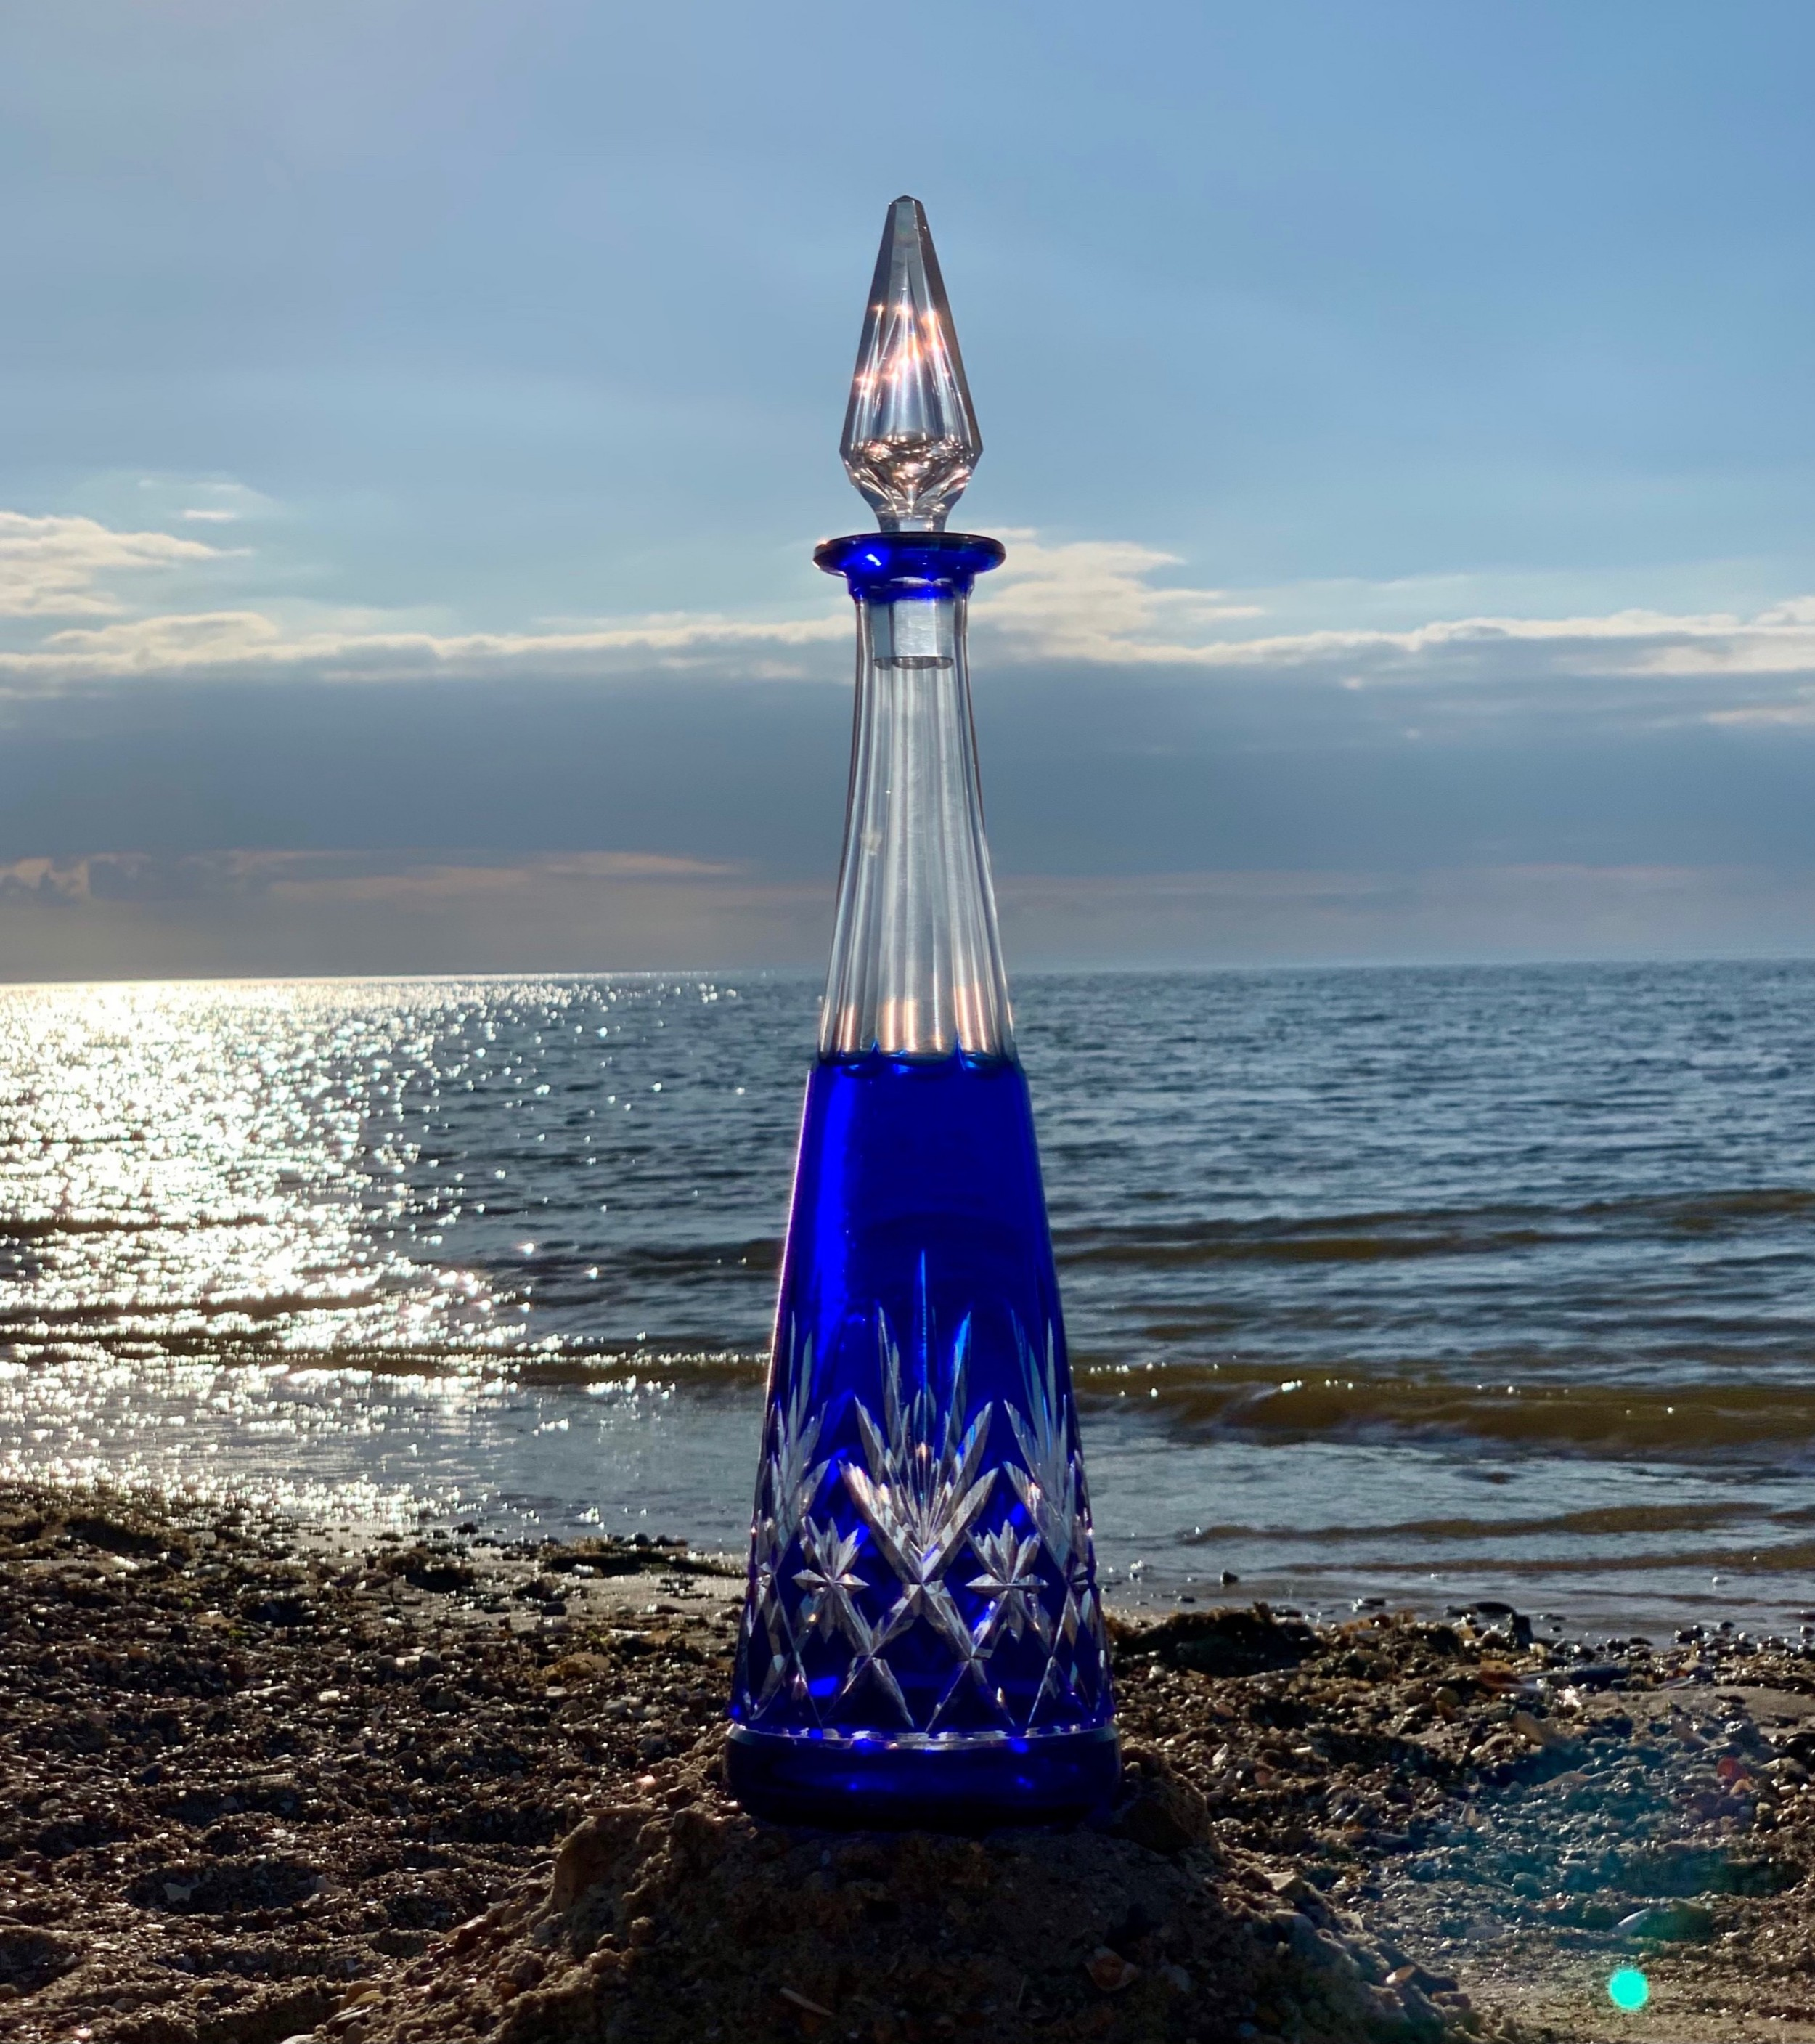 st louis crystal massenet cobalt blue decanter c 1920